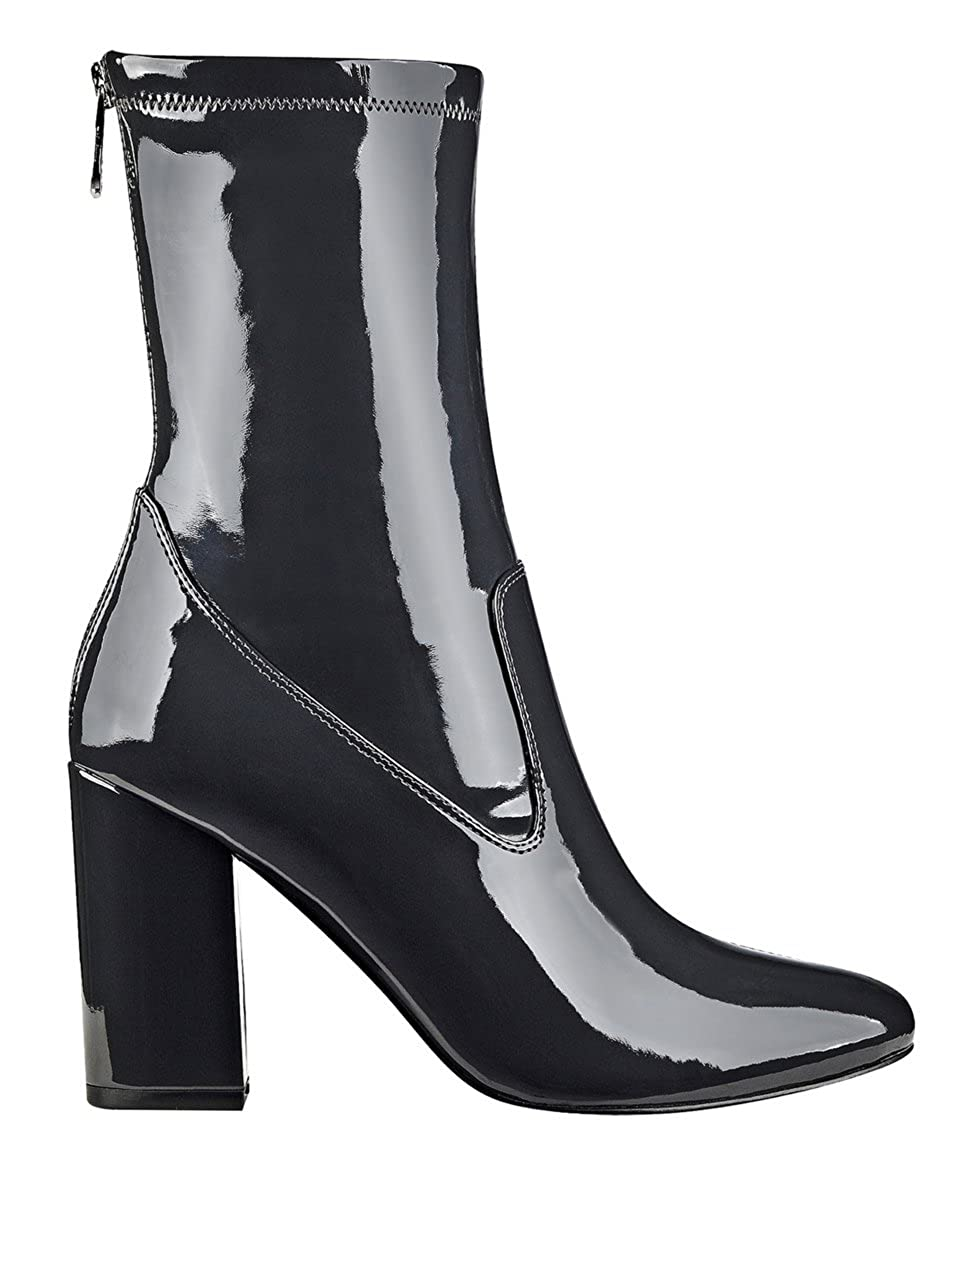 Guess Frauen Pumps Pumps Pumps rund Fashion Stiefel Grau Groesse 6.5 US  37.5 EU 48cc9d